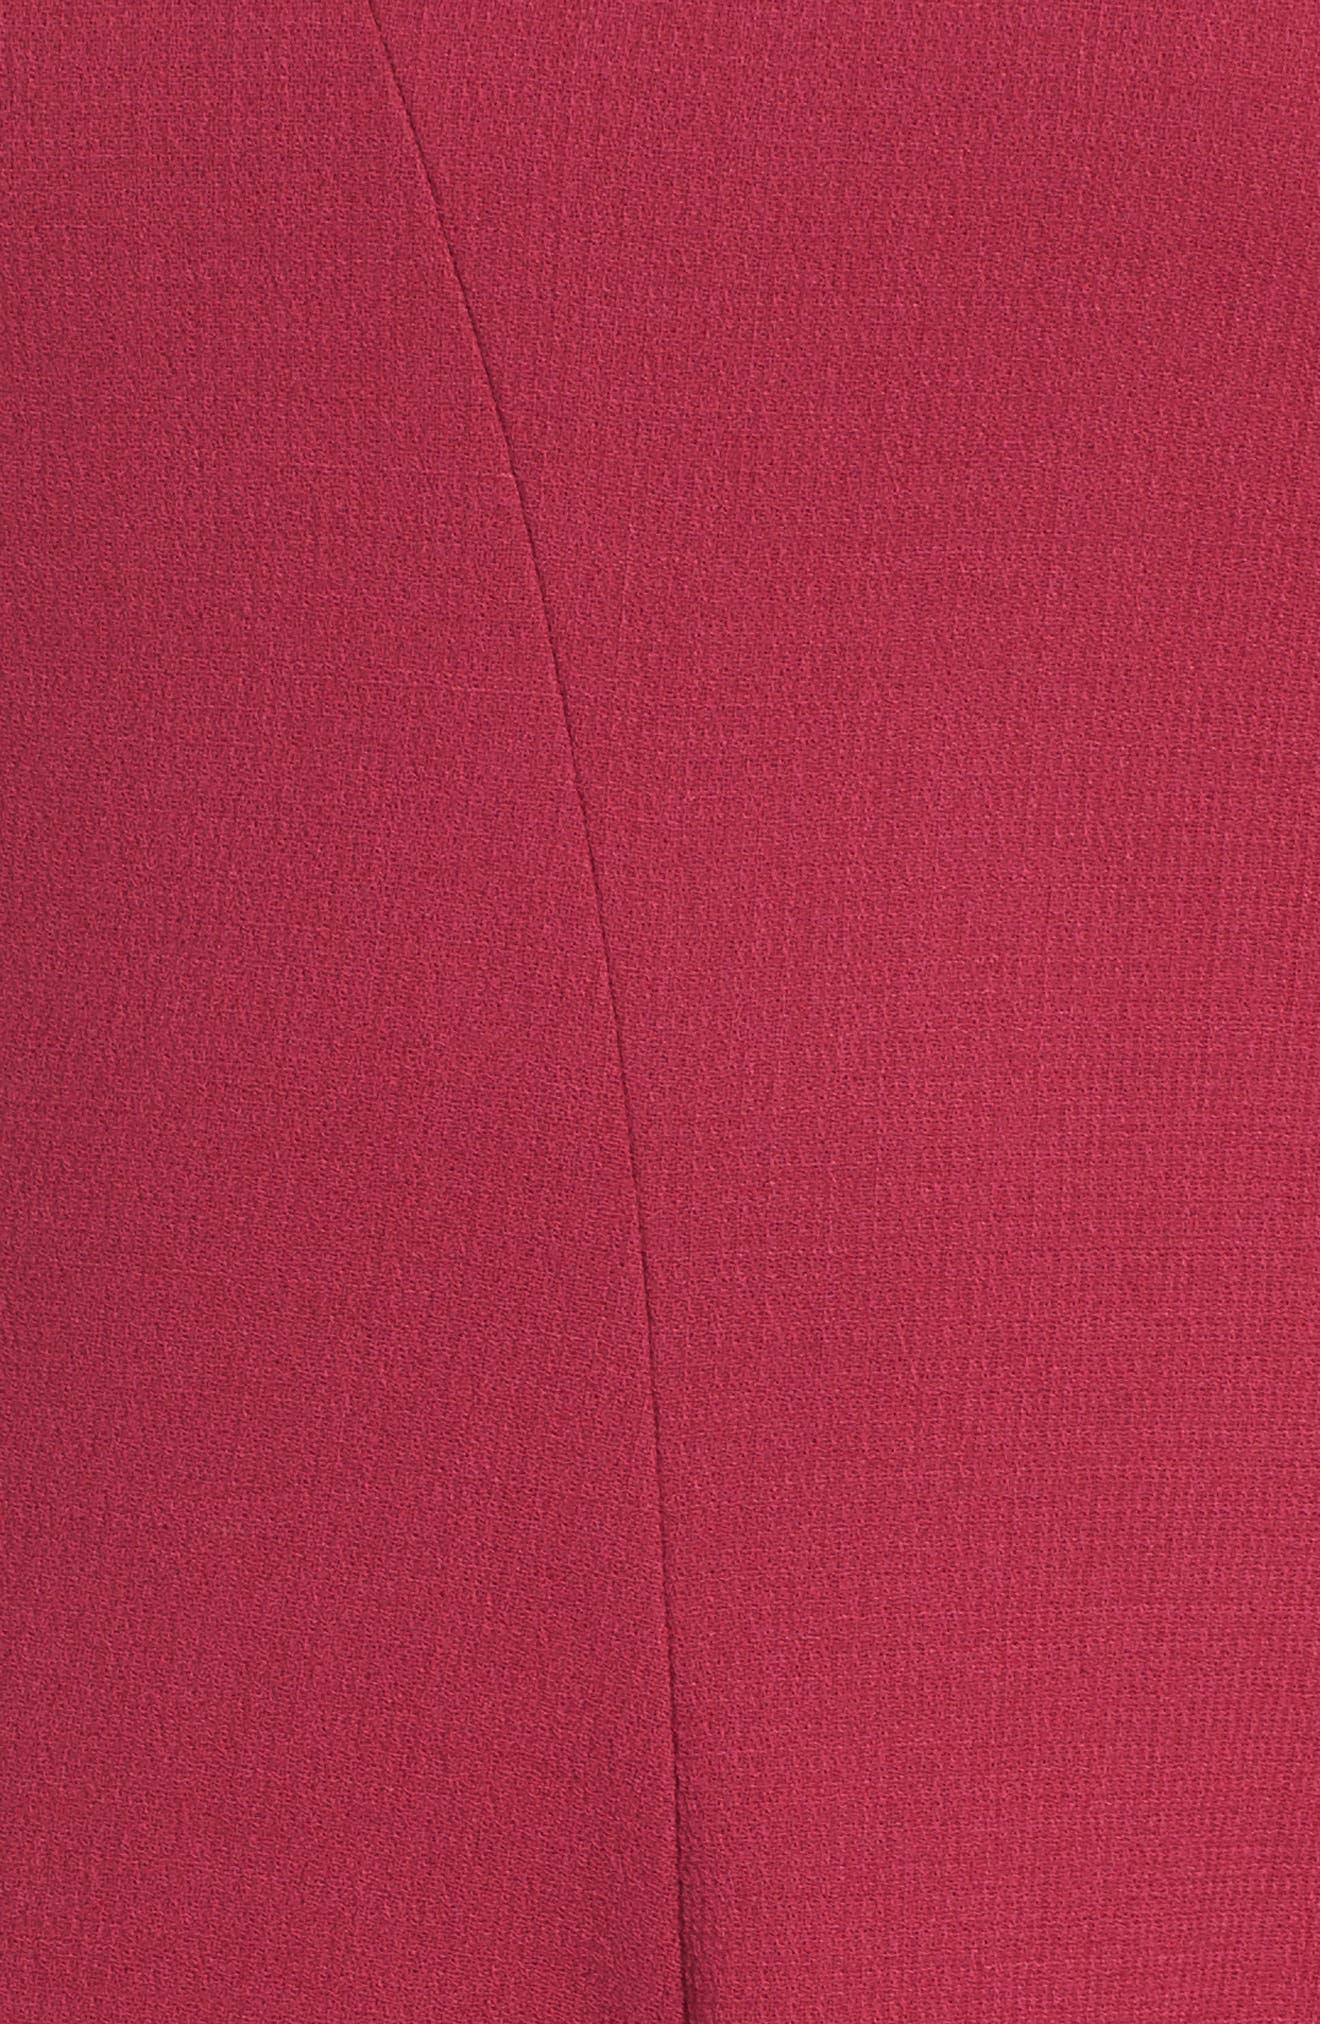 Aveena Wool Interlock Dress,                             Alternate thumbnail 5, color,                             651